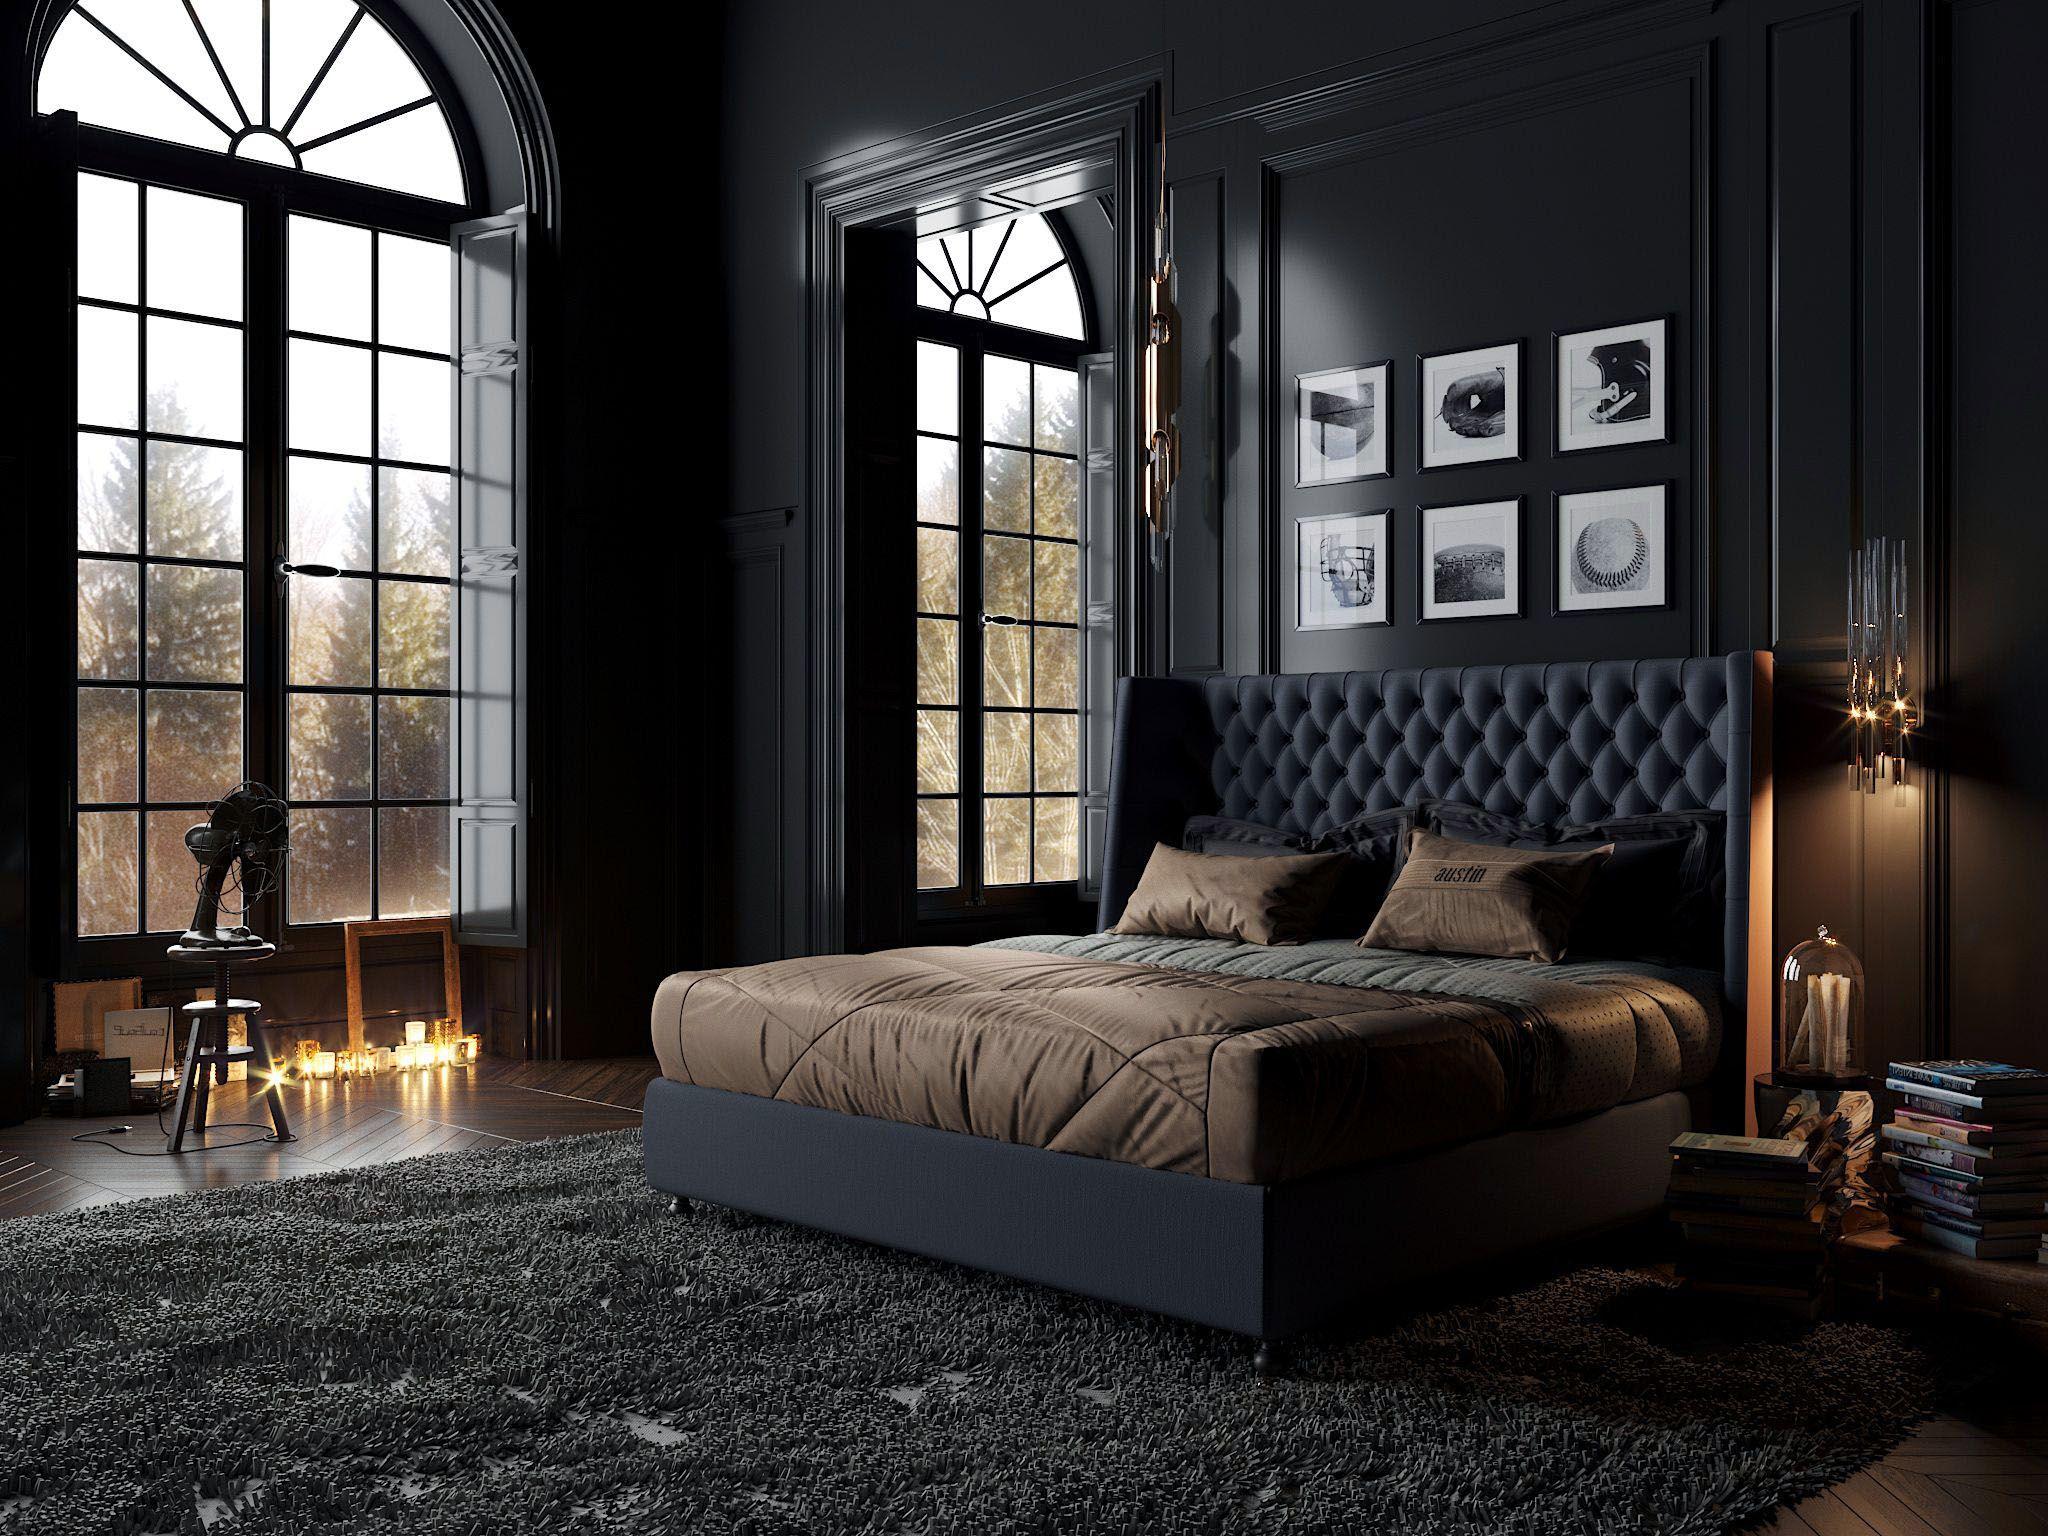 Impressive Dark Hipster Bedroom Tumblr On This Favorite Site Black Bedroom Design Classic Bedroom Luxurious Bedrooms